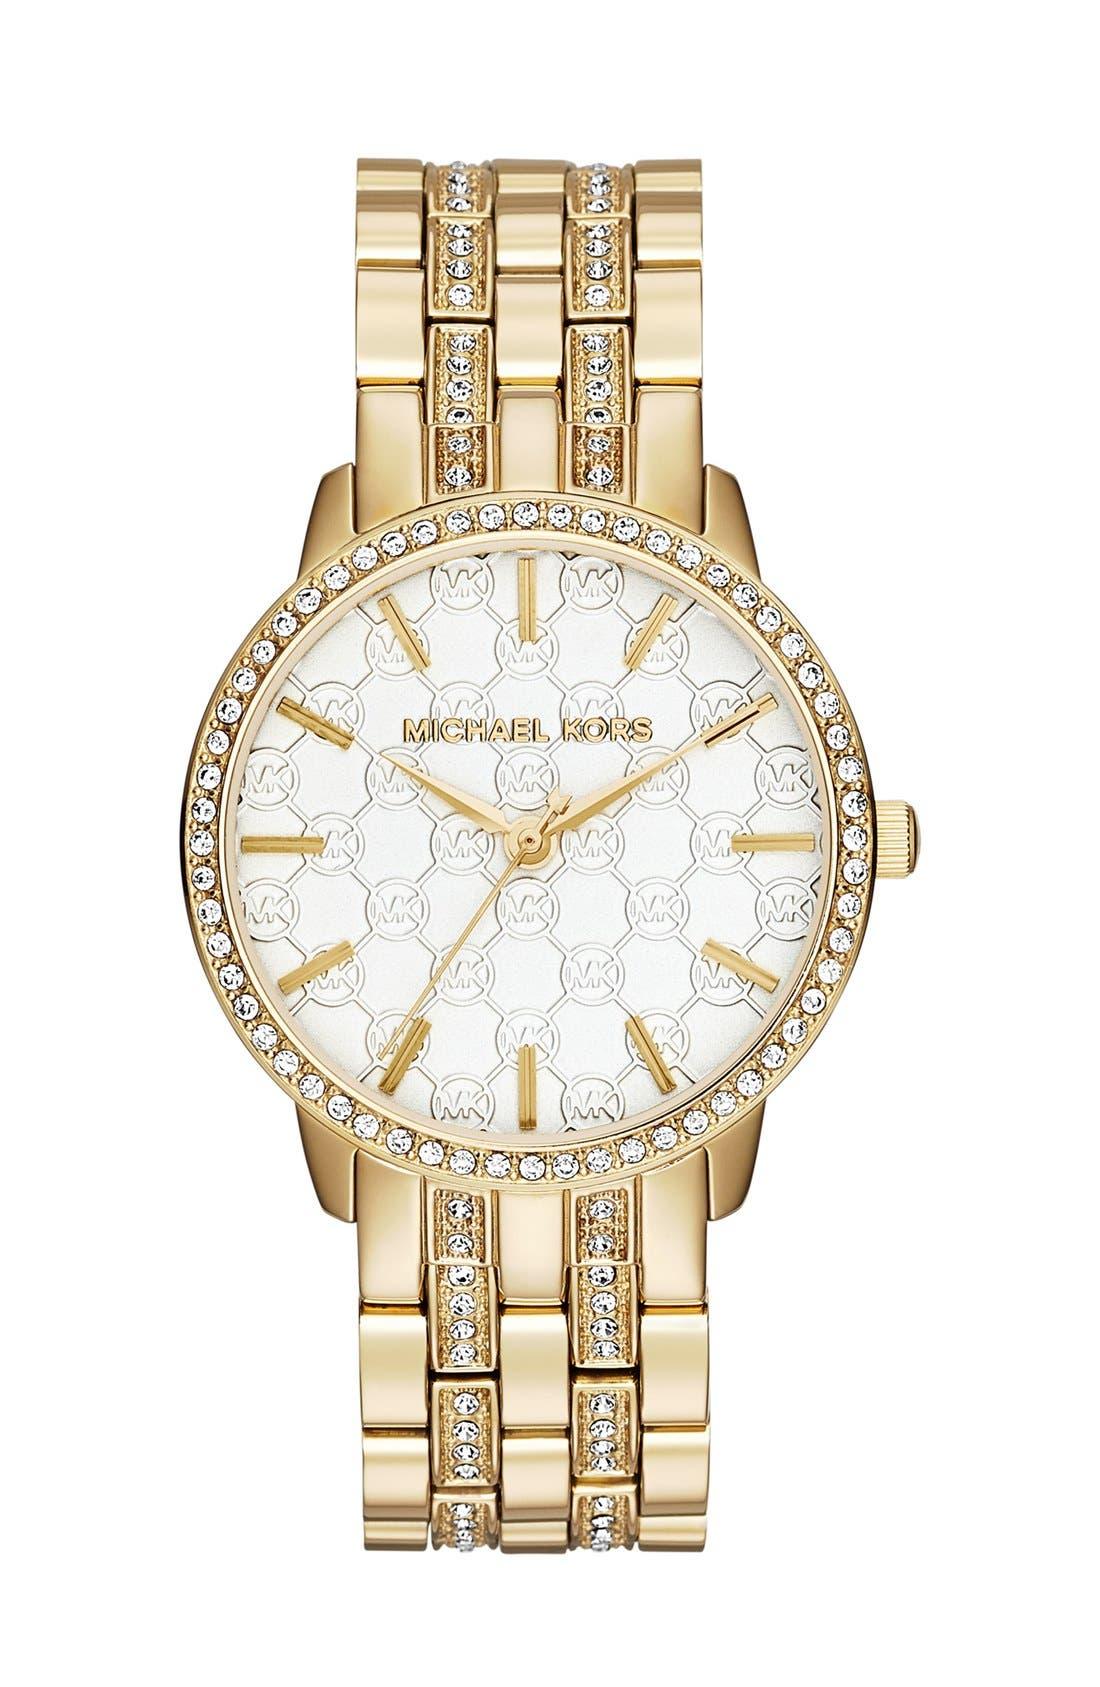 Main Image - Michael Kors 'Lady Nini' Round Bracelet Watch, 35mm